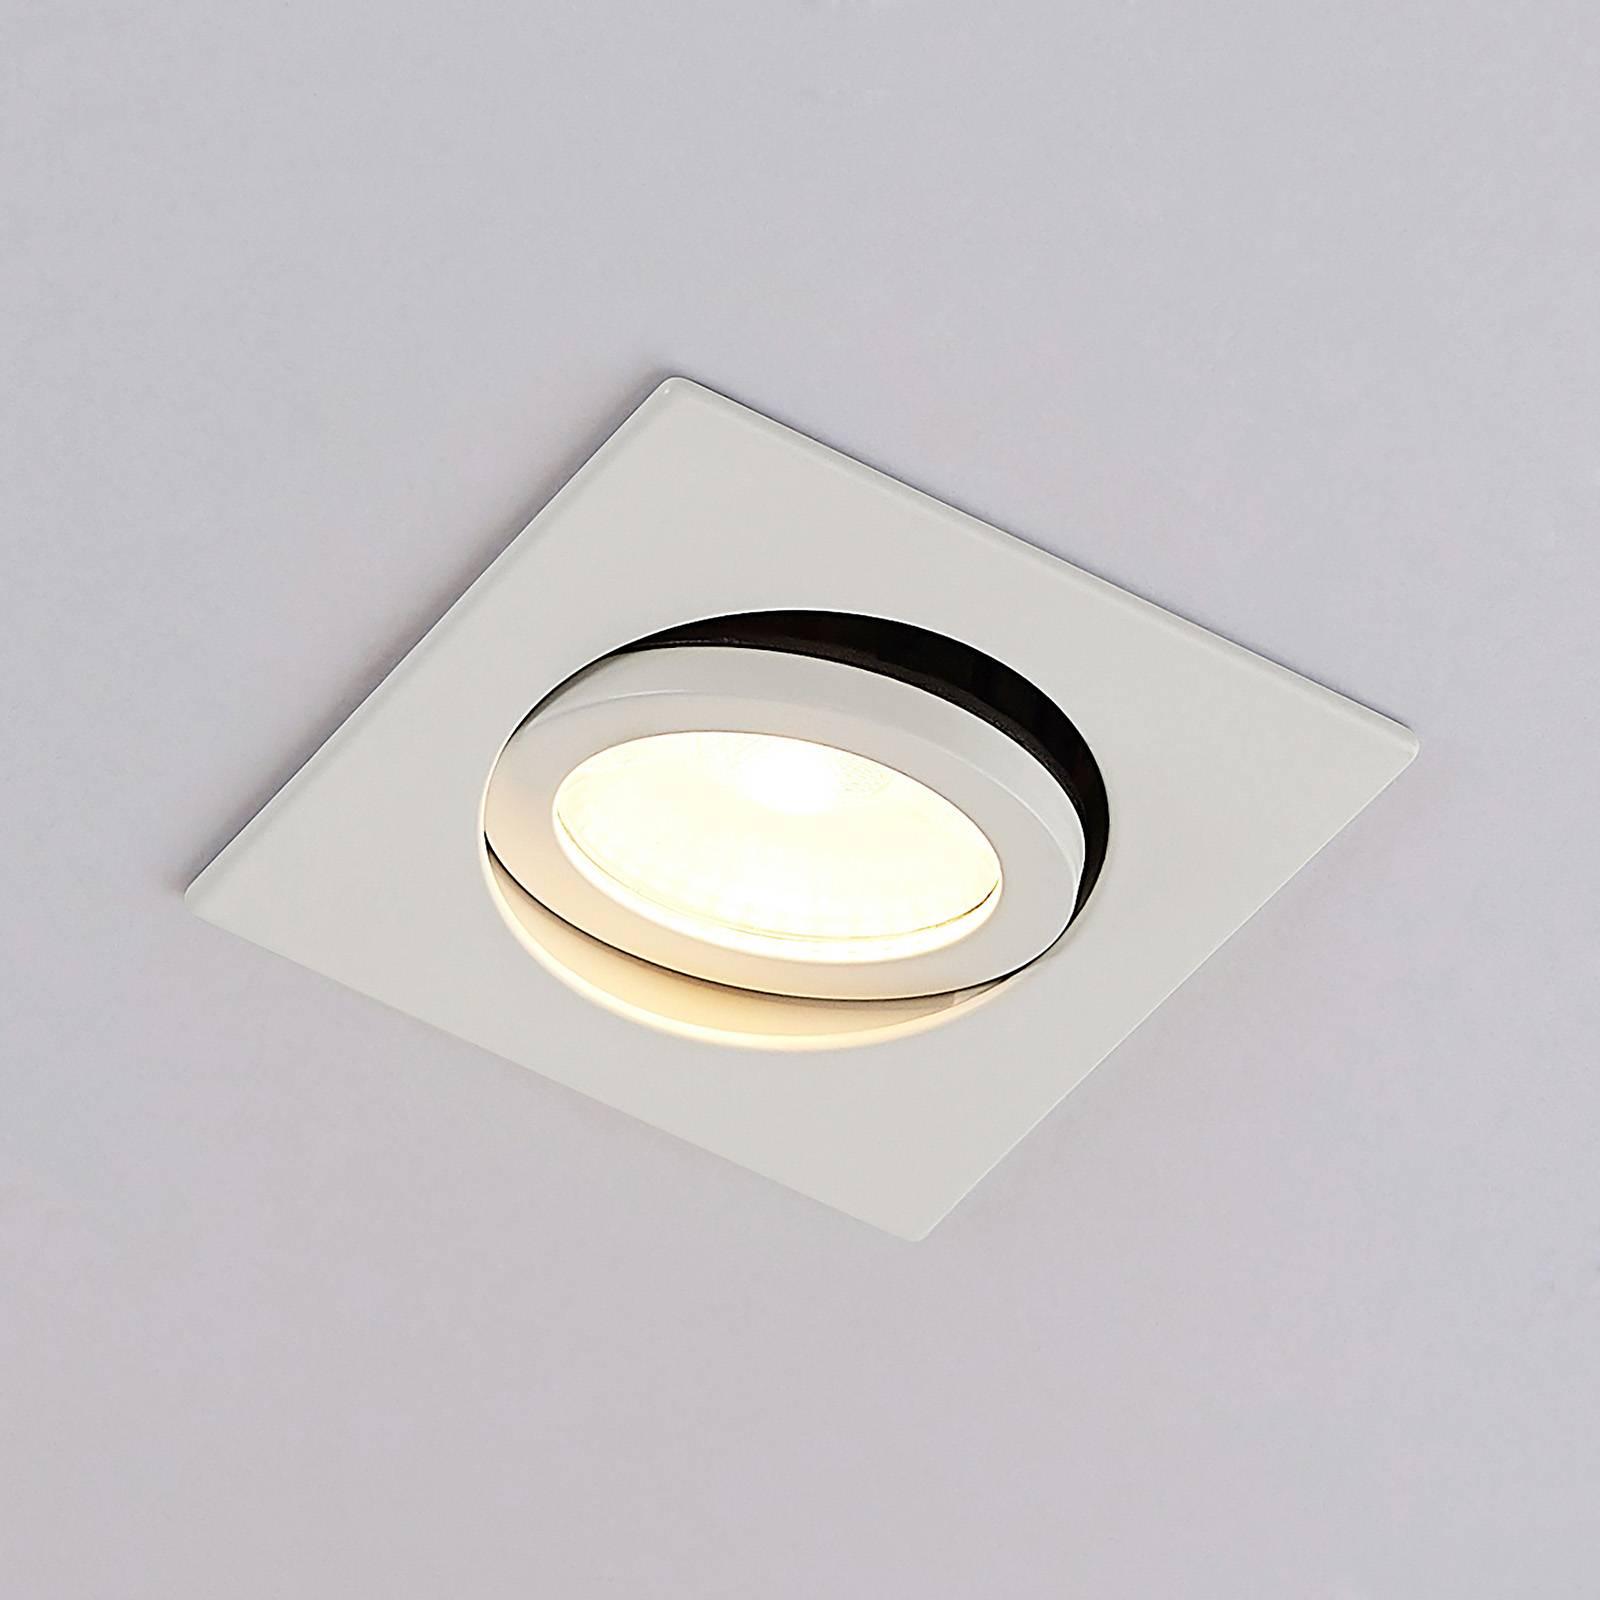 Arcchio Dacio LED downlight hoekig 36° IP65, 8,2W